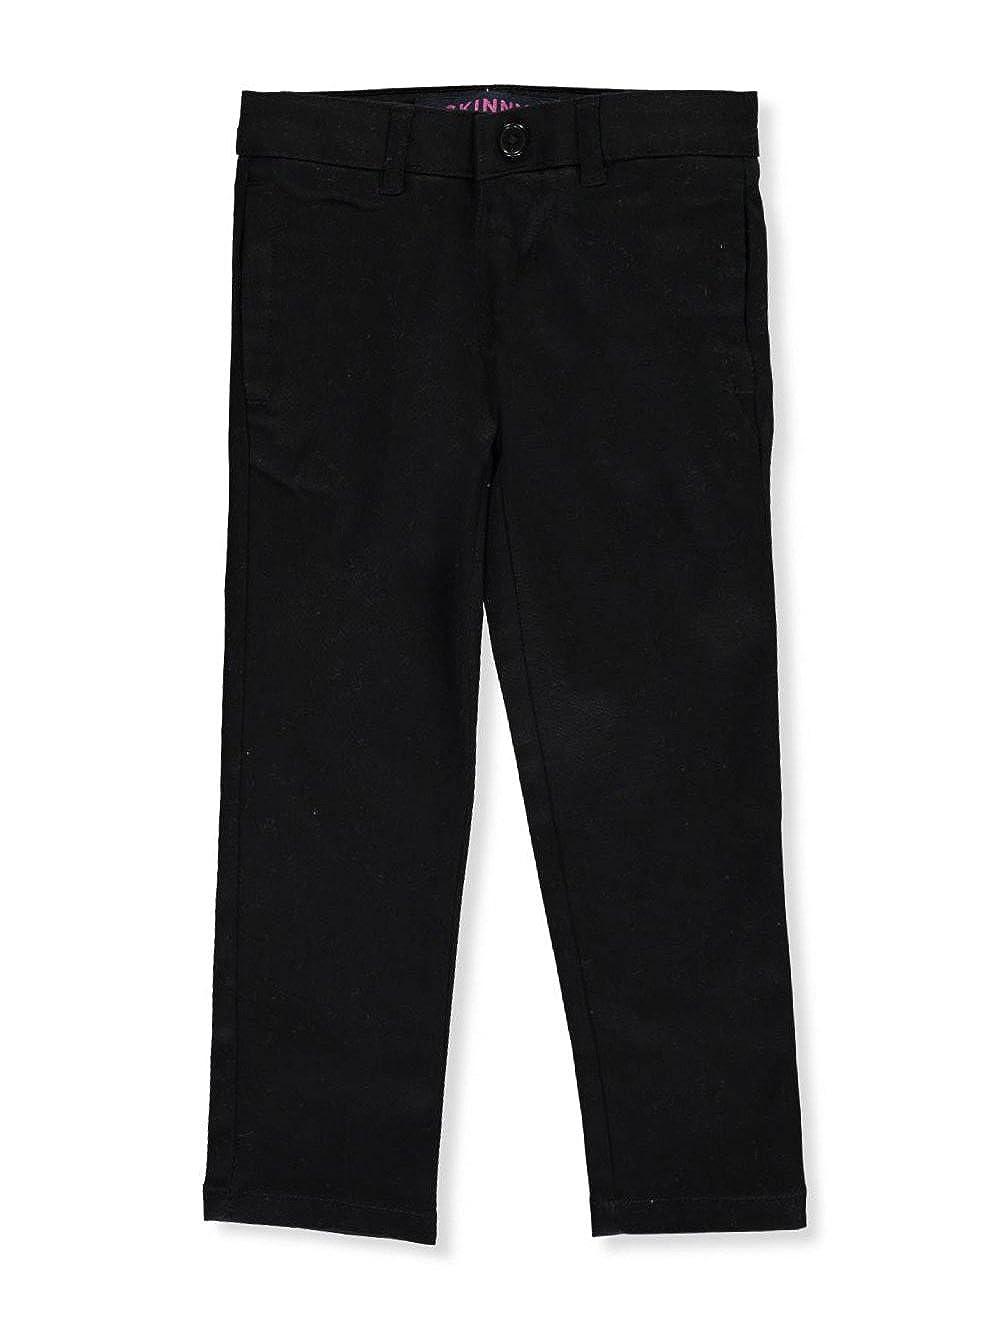 6X French Toast Little Girls Stretch Twill Skinny Uniform Pants Black